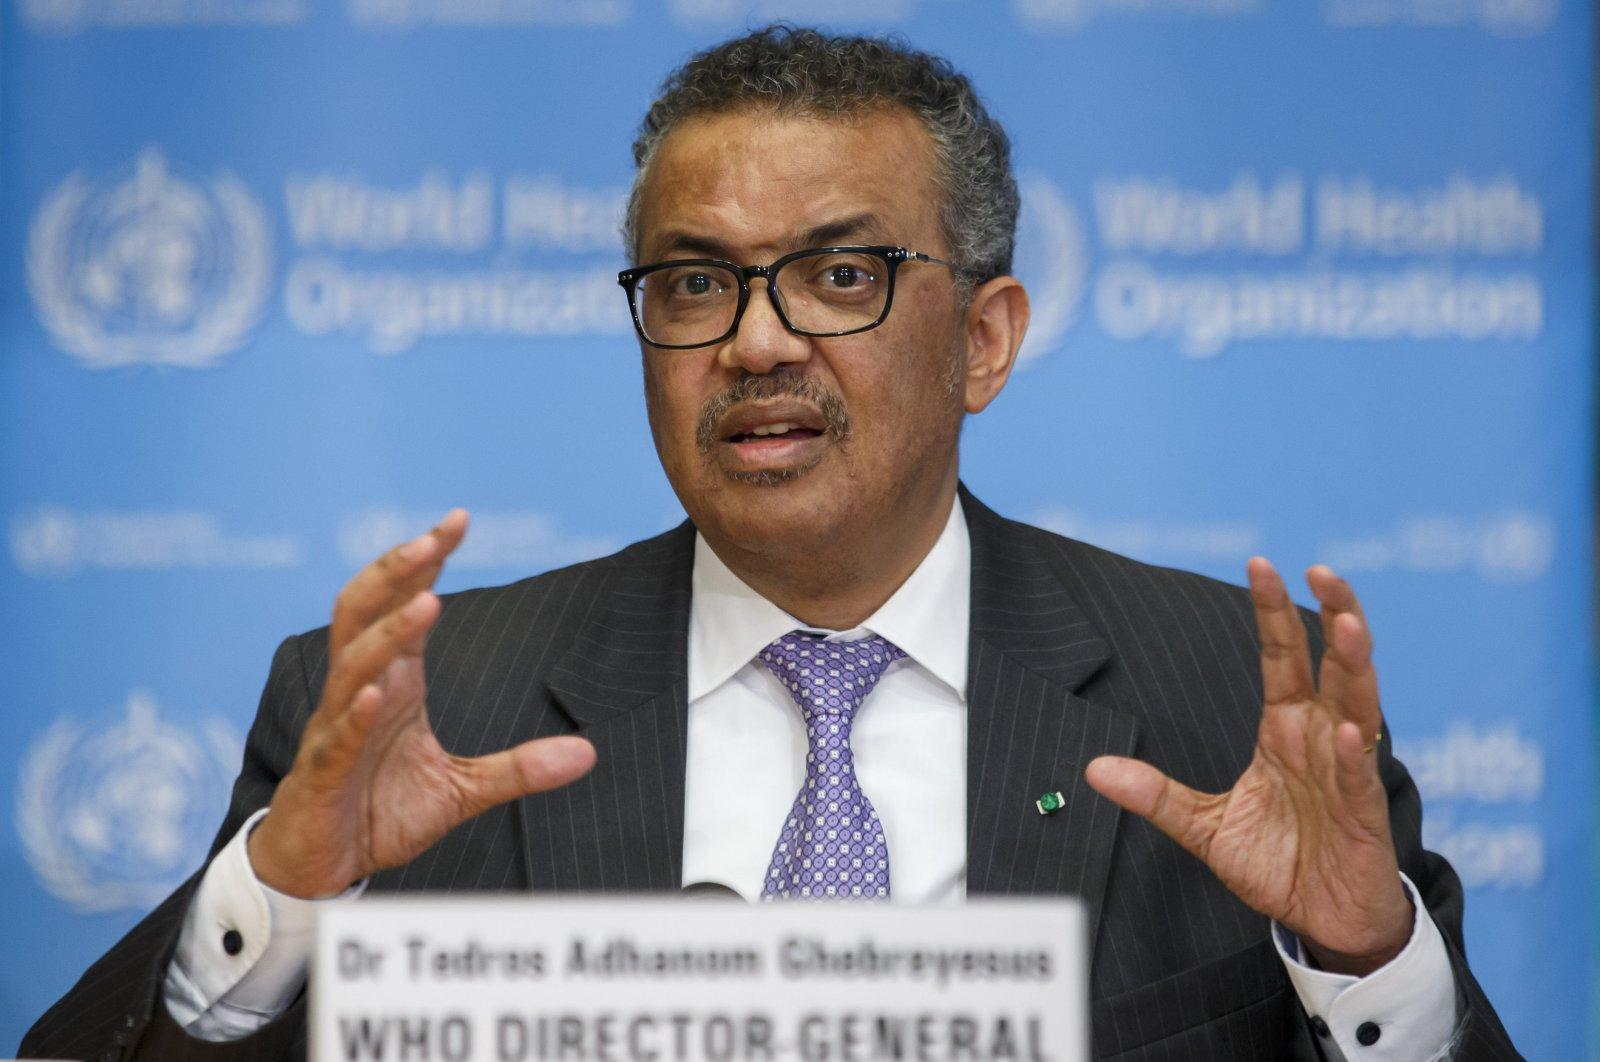 Tedros Adhanom Ghebreyesus, director-general of the World Health Organization, speaks during a news conference on updates regarding the novel coronavirus, at the WHO headquarters in Geneva, Switzerland, March 9, 2020. (AP Photo)